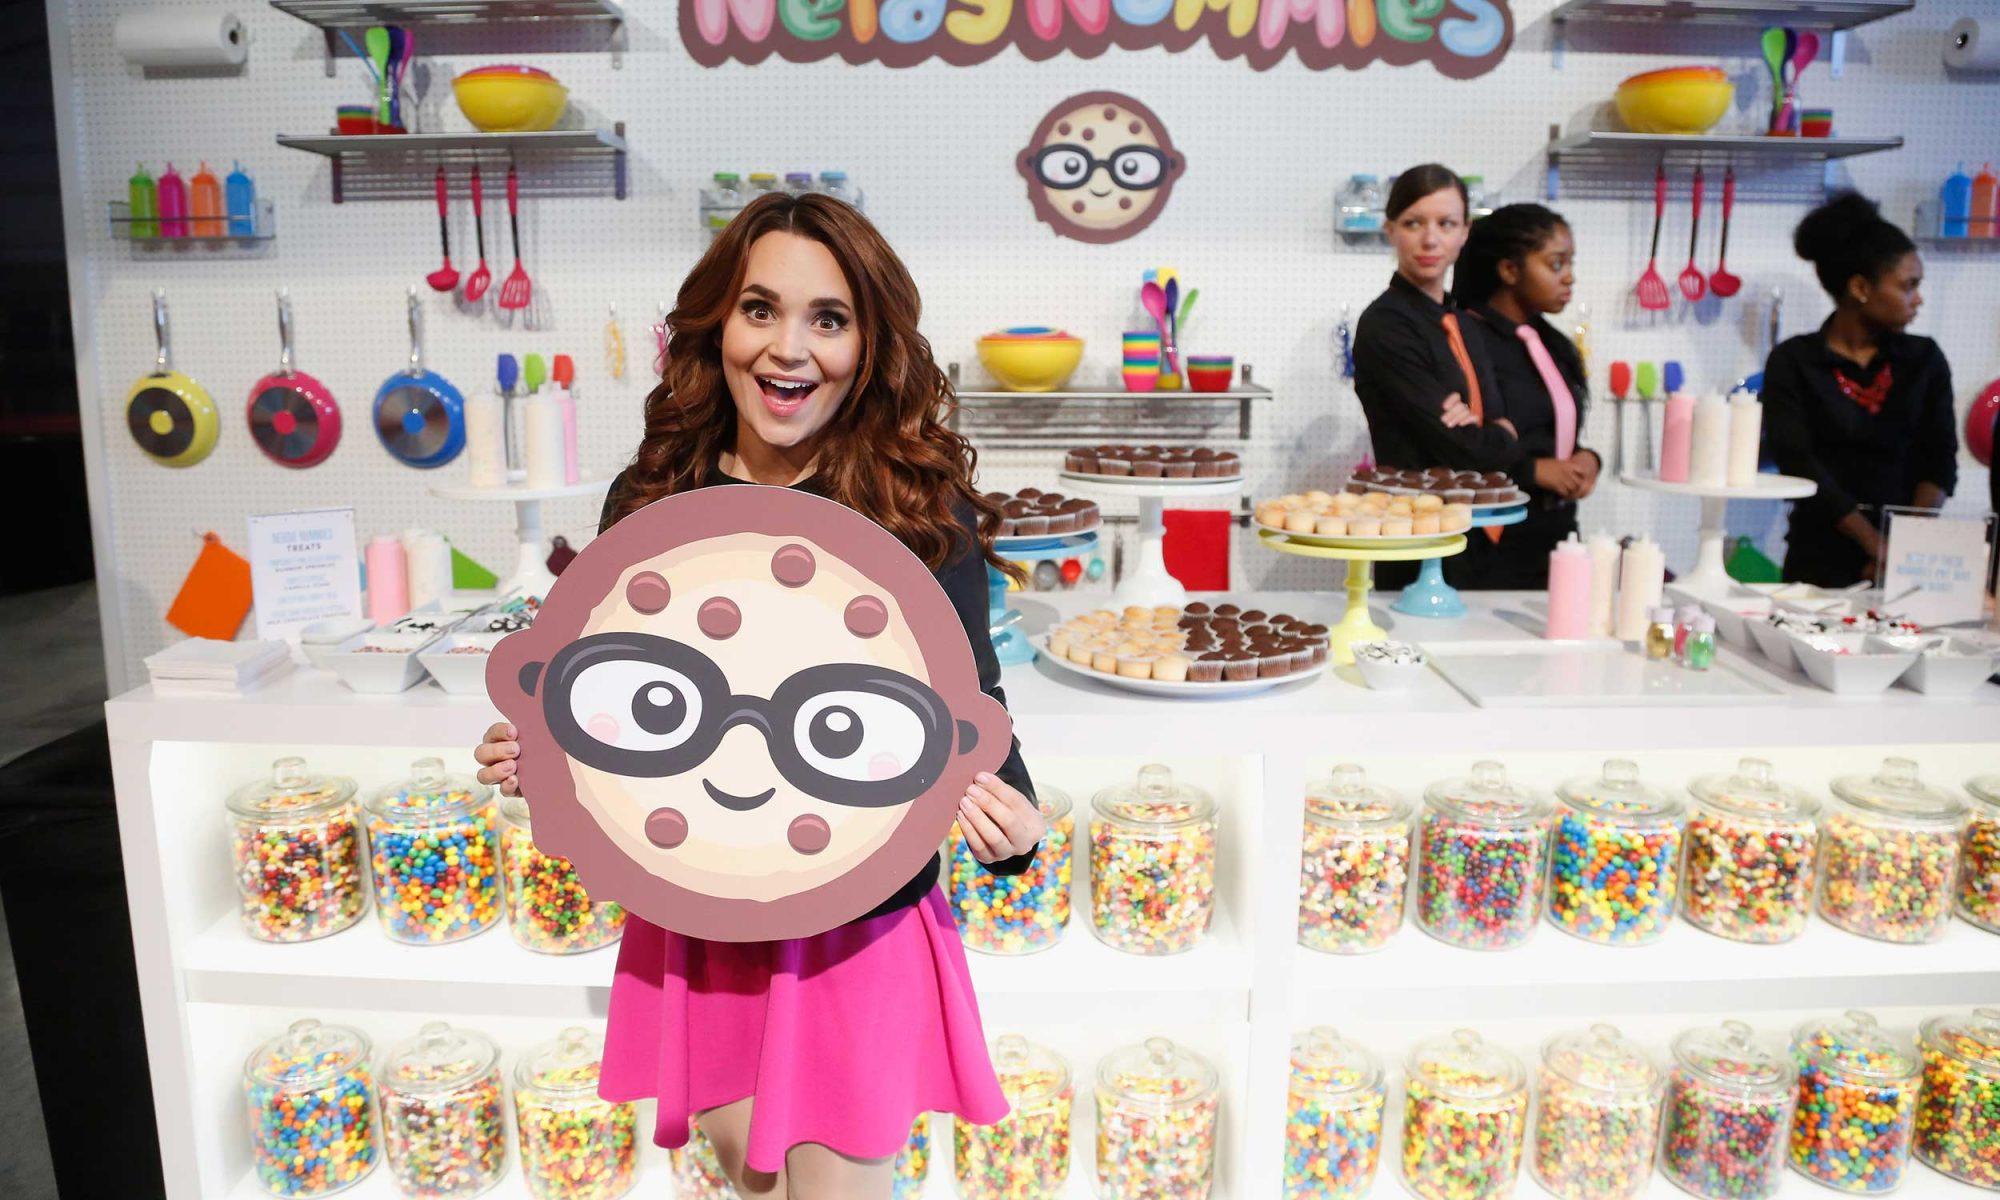 EC: How Rosanna Pansino of 'Nerdy Nummies' Does Breakfast